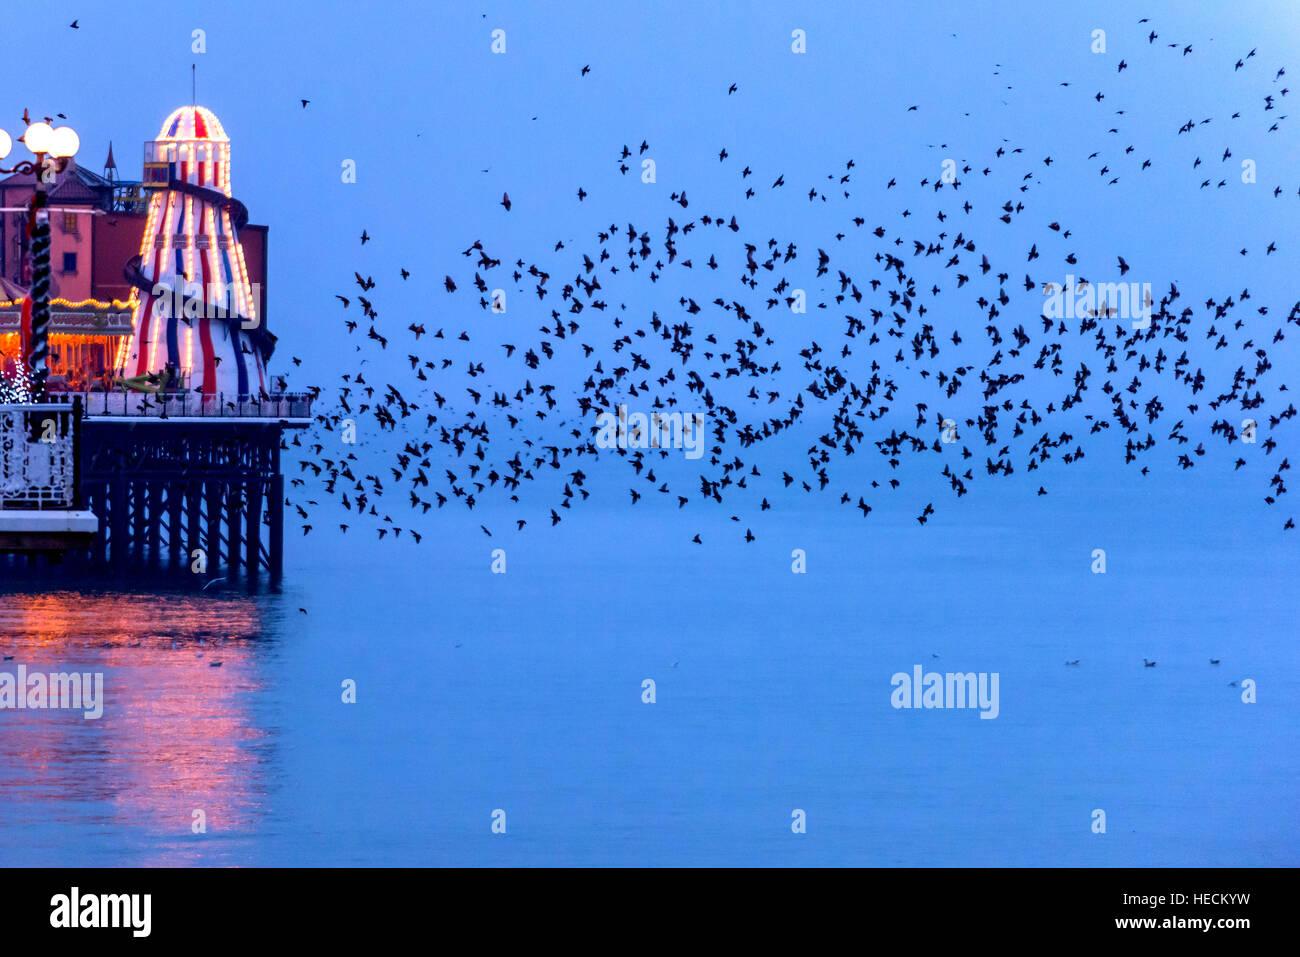 Brighton, UK. 19th Dec, 2016. Weather. Starlings murmurating around Brighton's Palace Pier prior to roosting - Stock Image